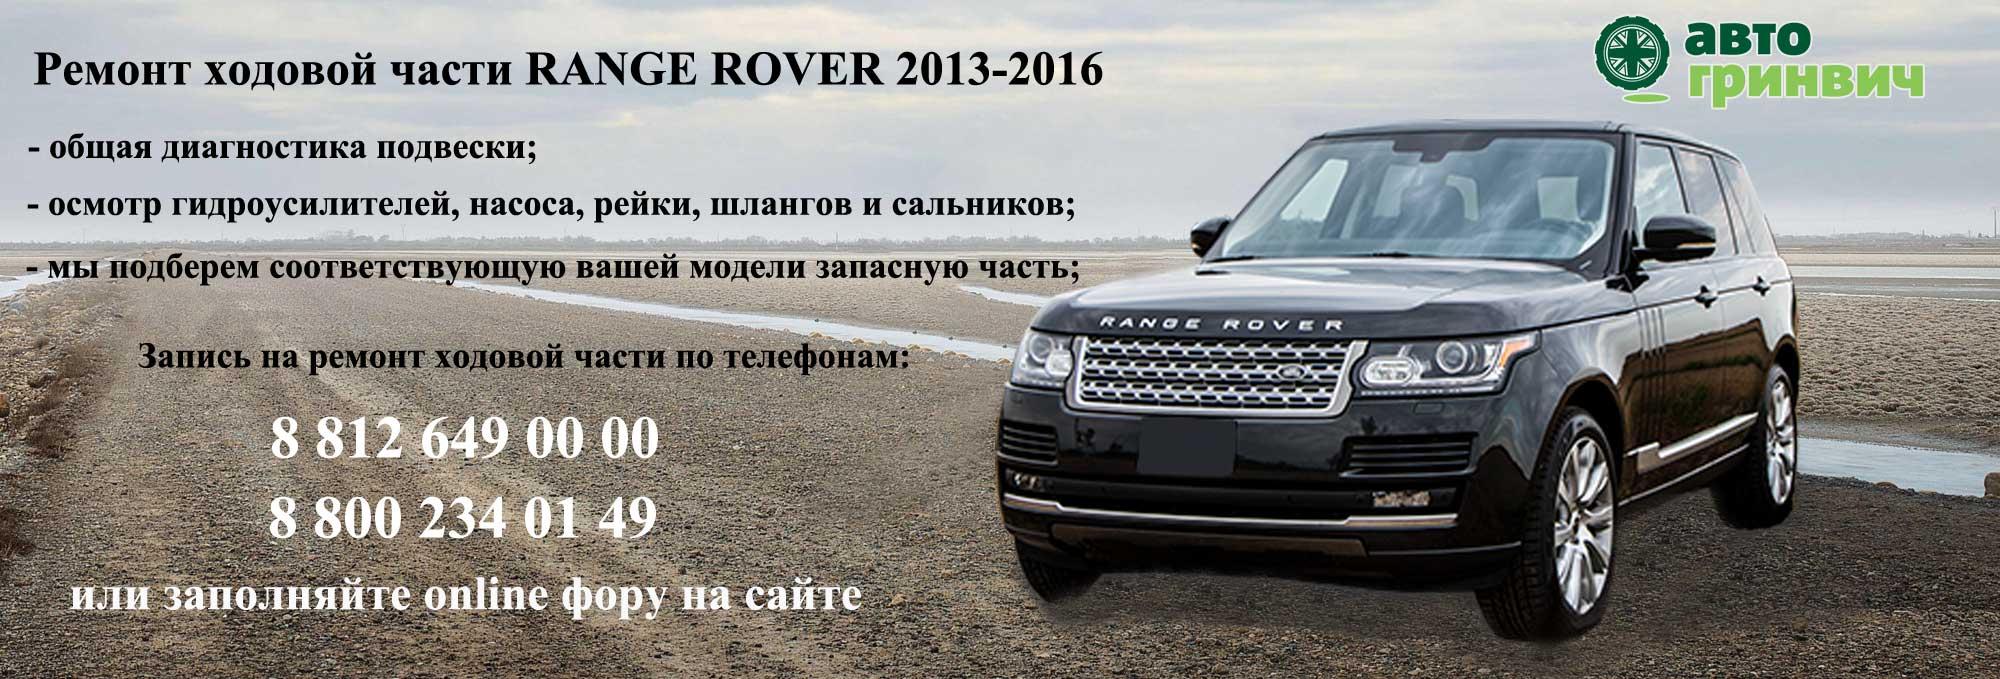 Ремонт ходовой части Range Rover 2013-2016